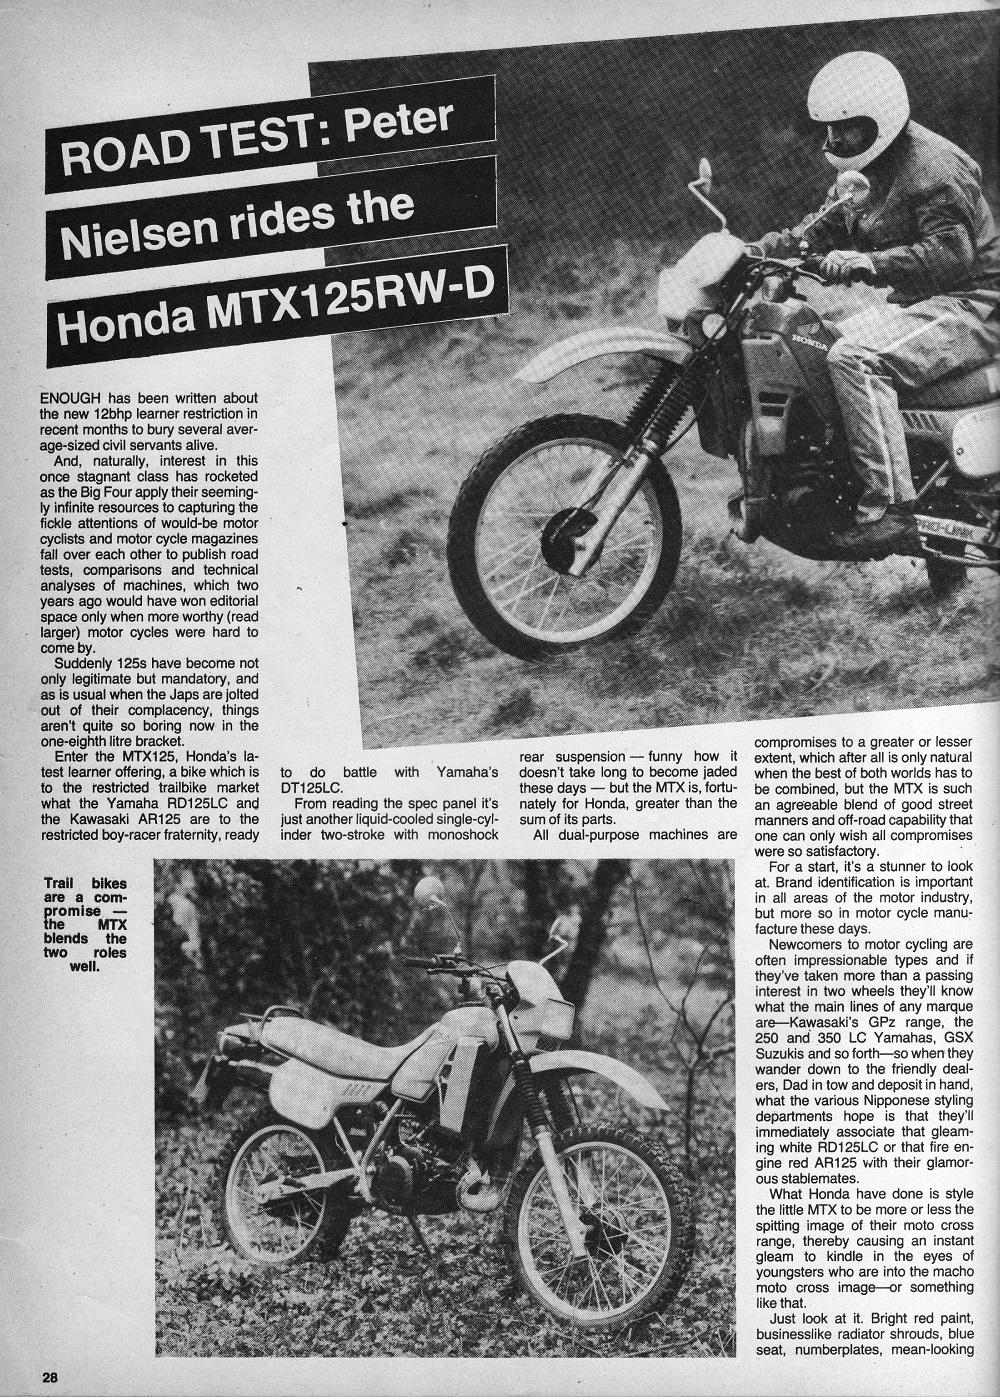 1983 Honda MTX125RW-D road test.1.jpg